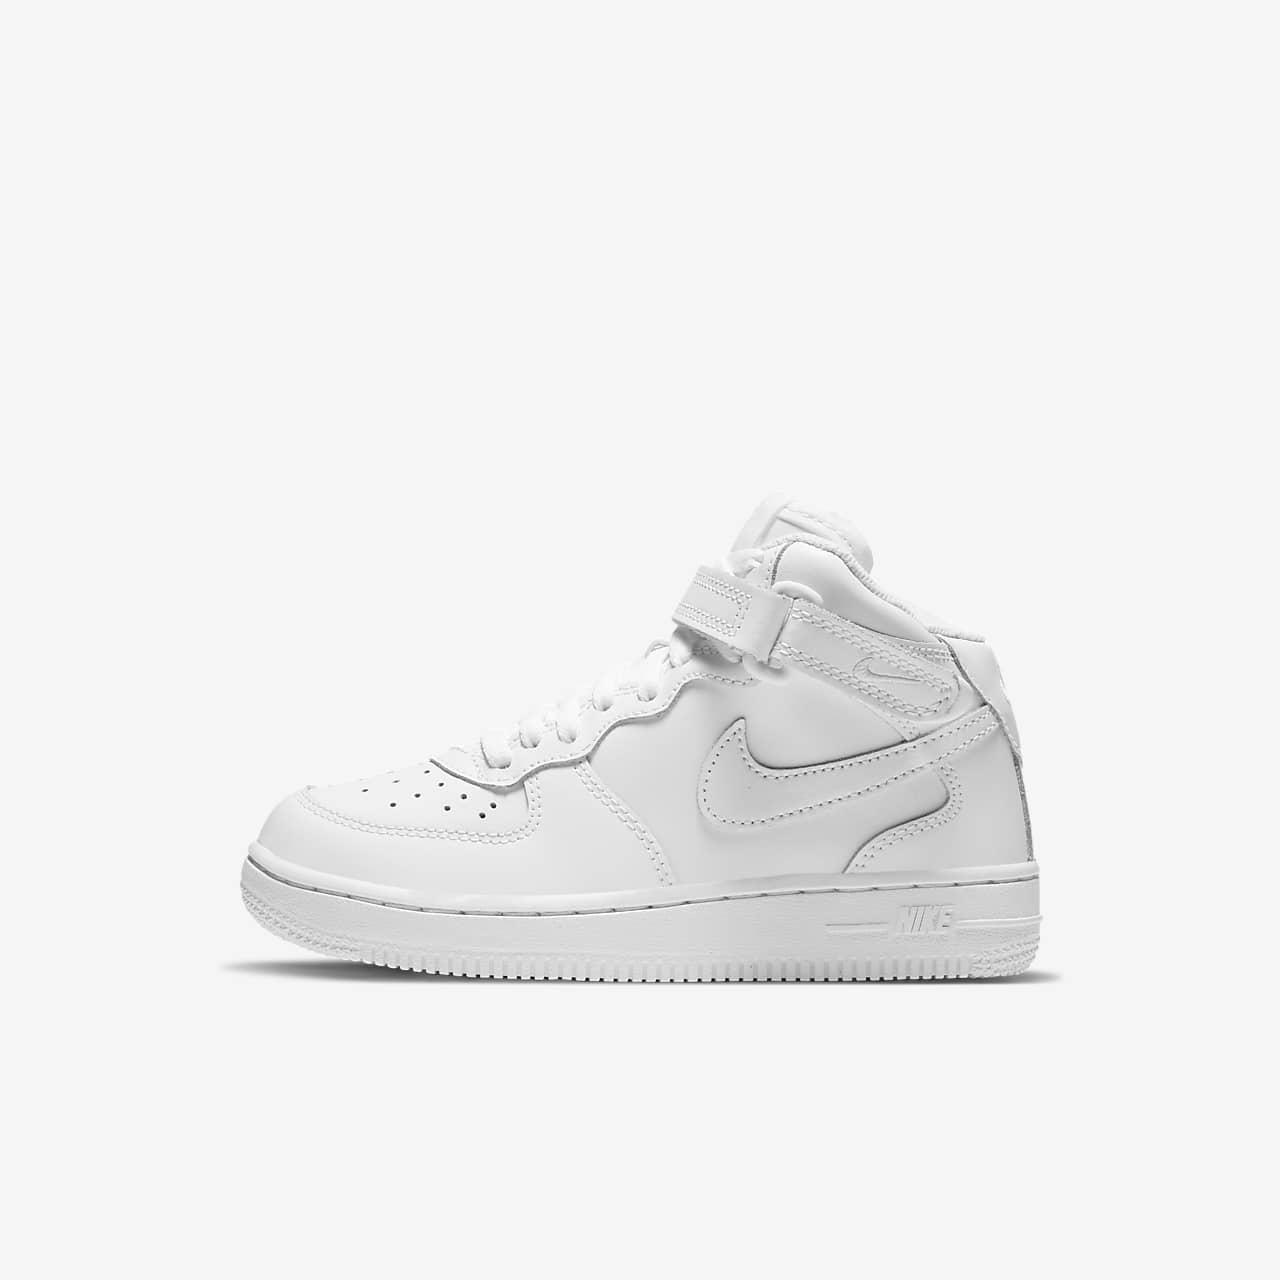 uk availability 438d1 a9f34 ... Nike Air Force 1 Mid - sko til små børn